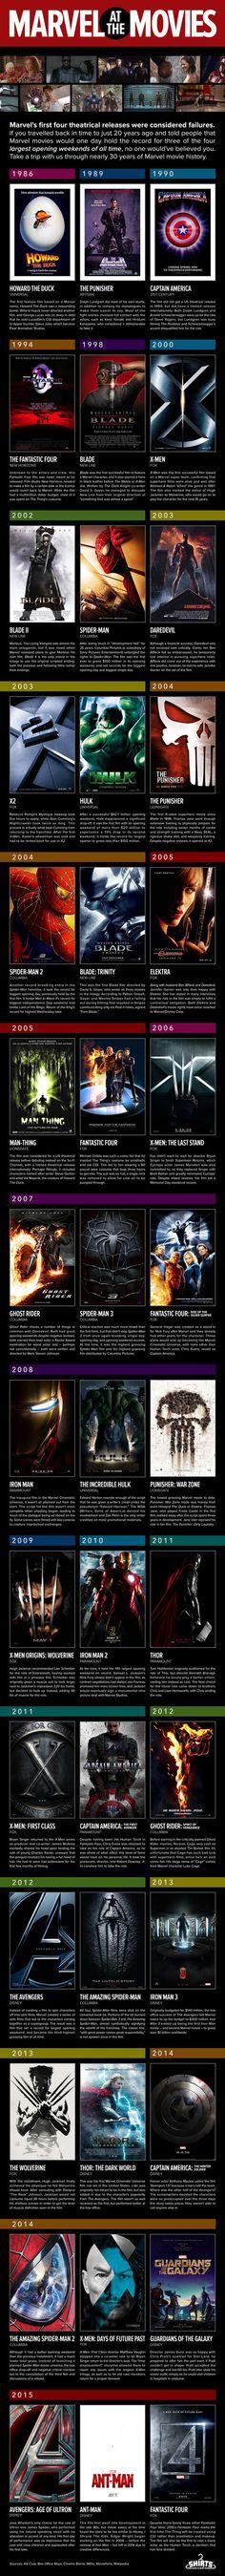 Marvel-Movies-Infographic